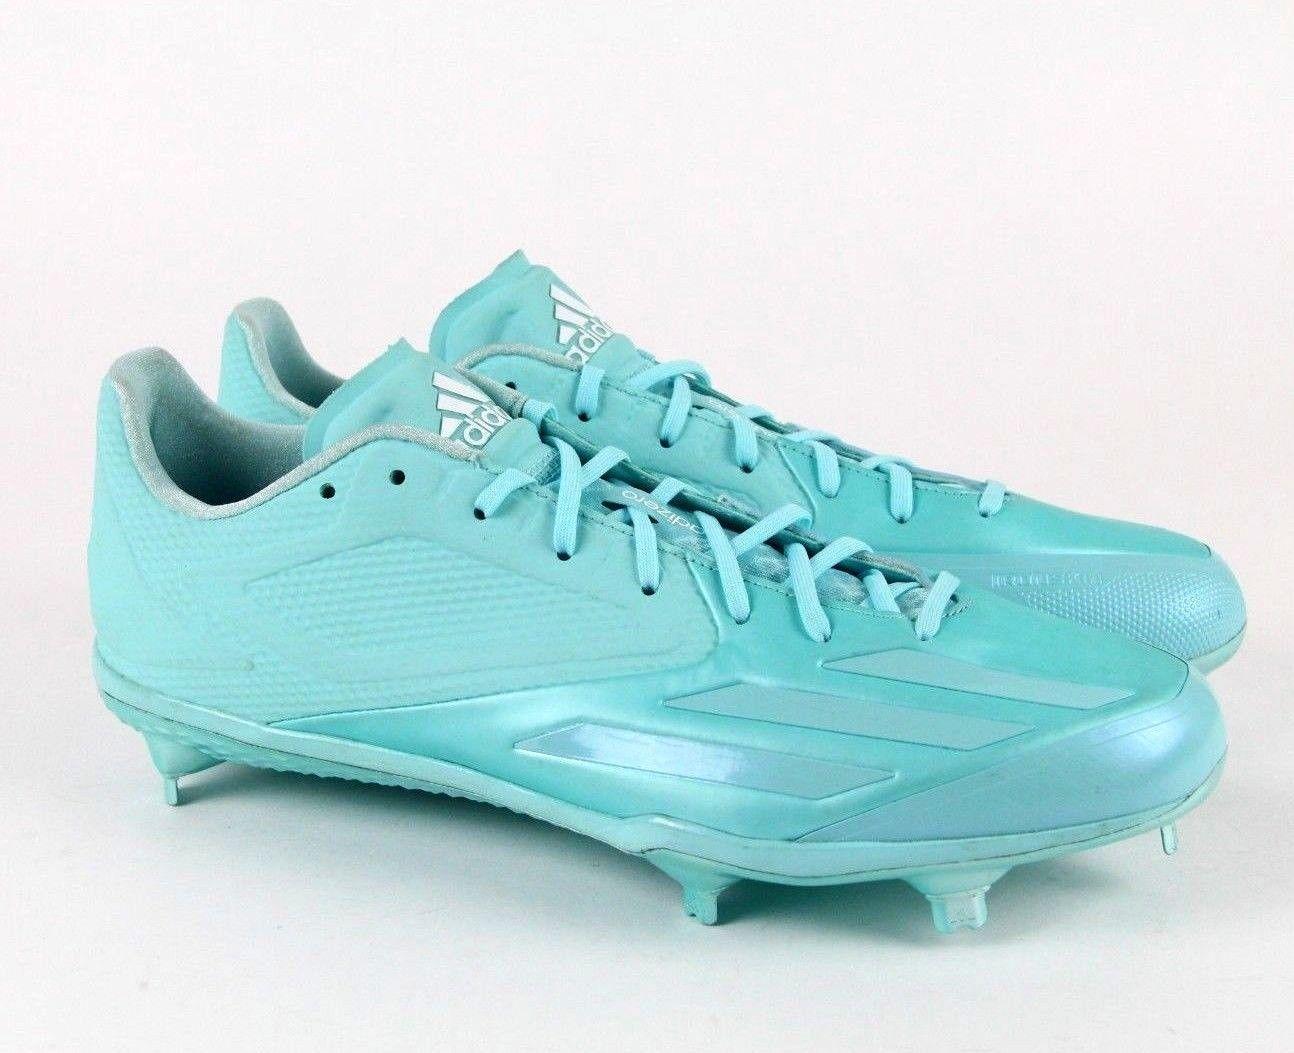 online retailer 4f59c 7daab Adidas Adizero Afterburner 3 Baseball Cleats and 29 similar items. S l1600